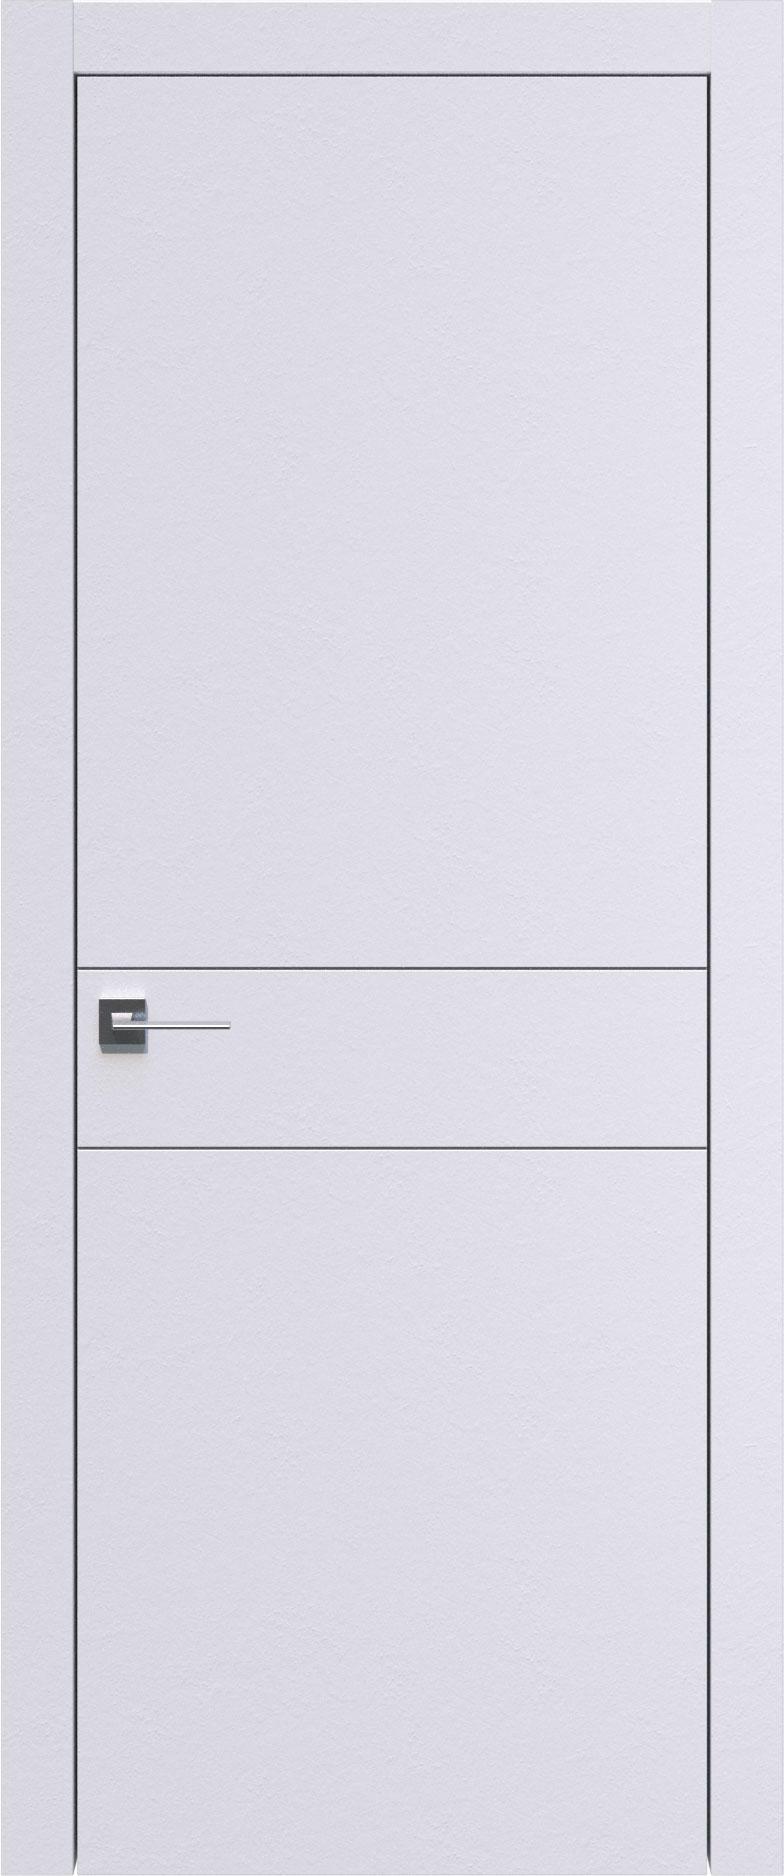 Tivoli И-2 цвет - Арктик белый Без стекла (ДГ)